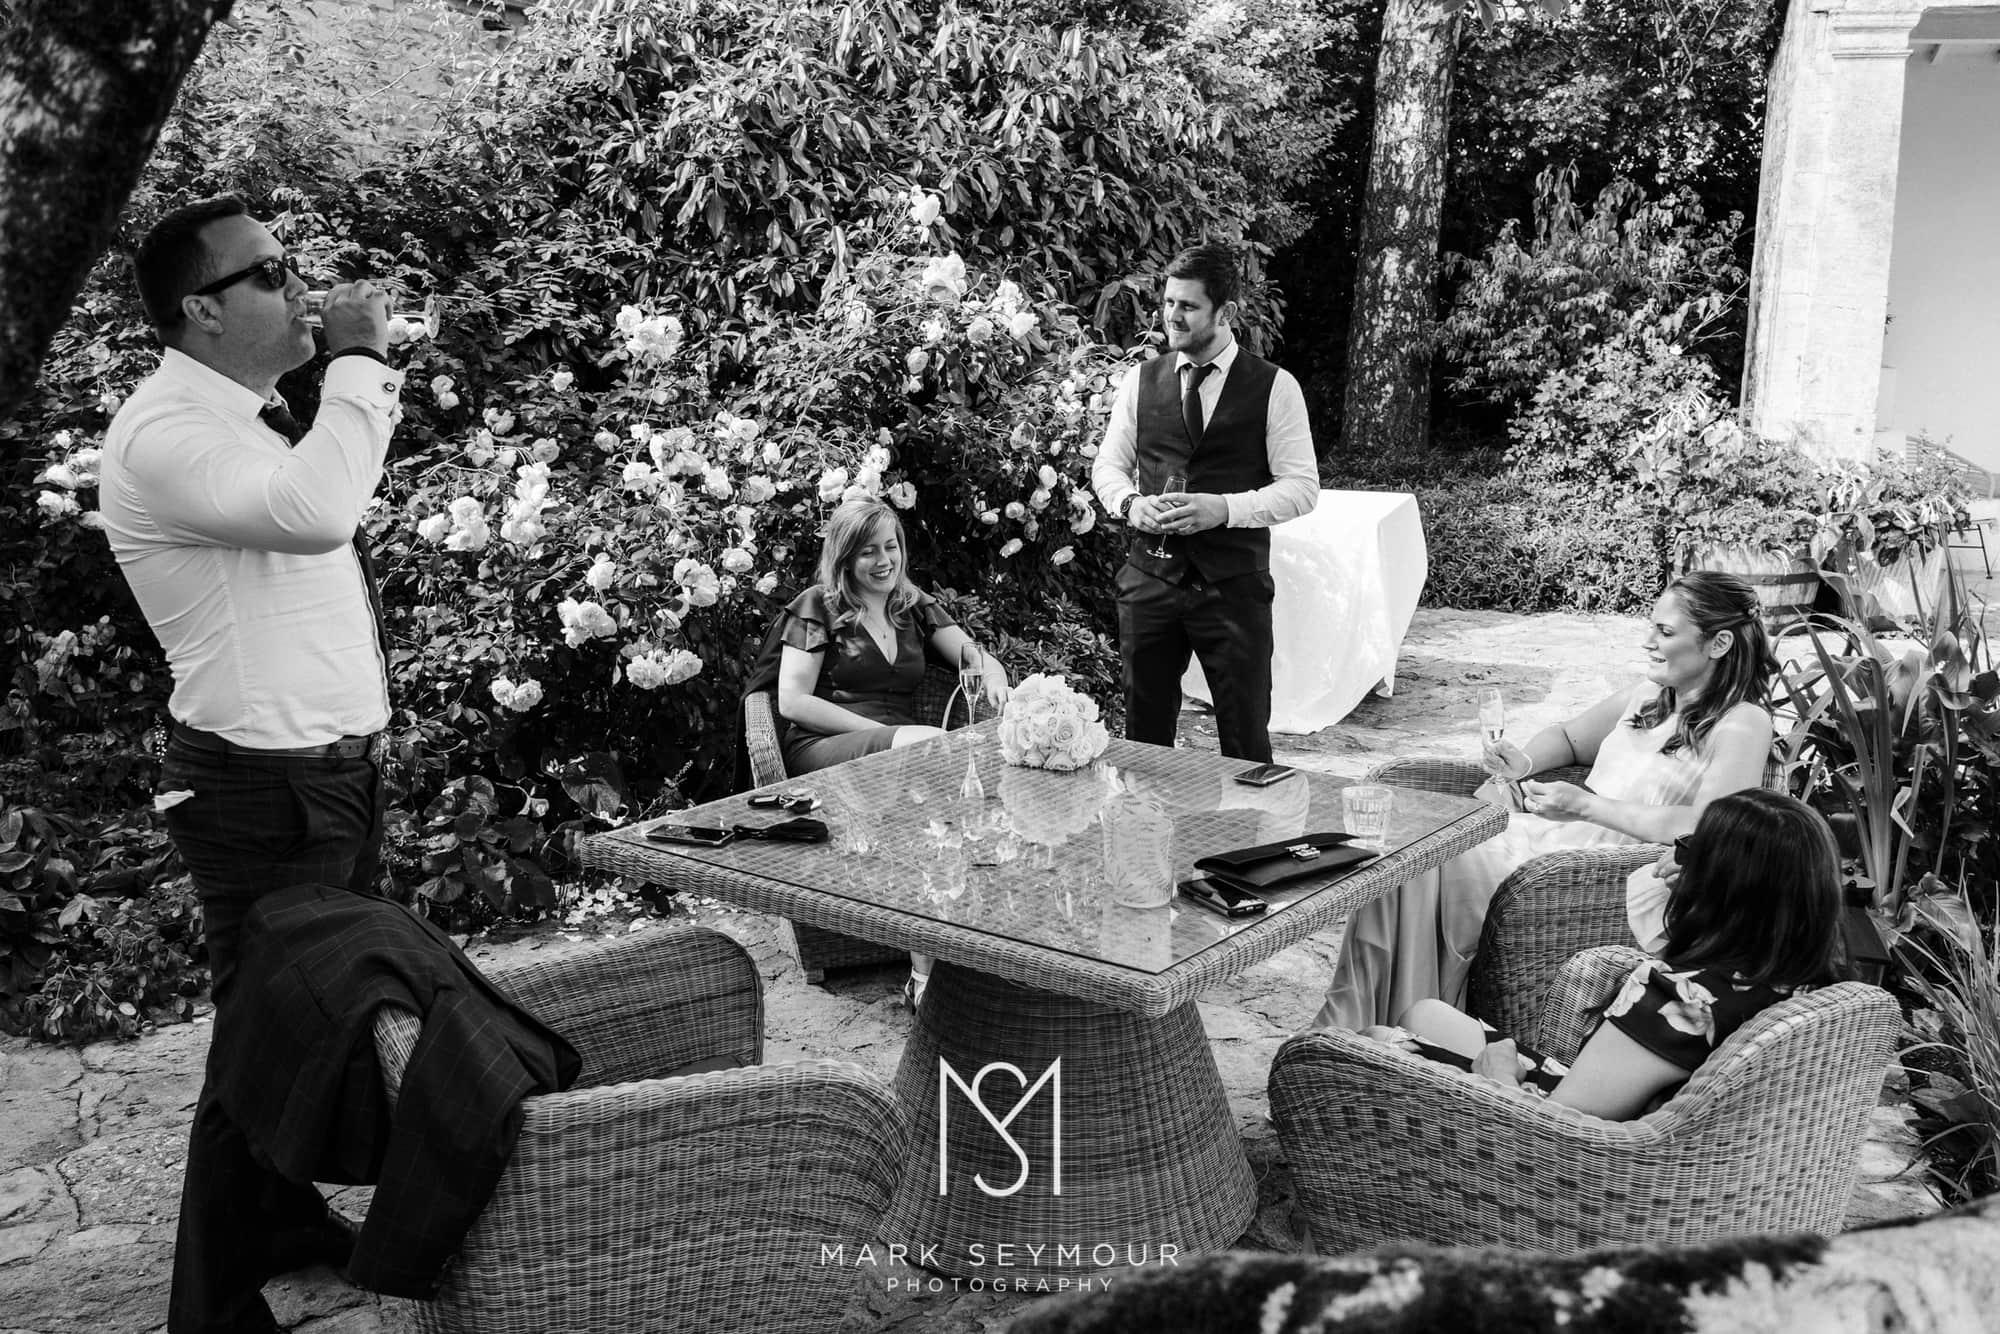 Barnsley House Wedding Photographer - Olivia and James' wedding 15